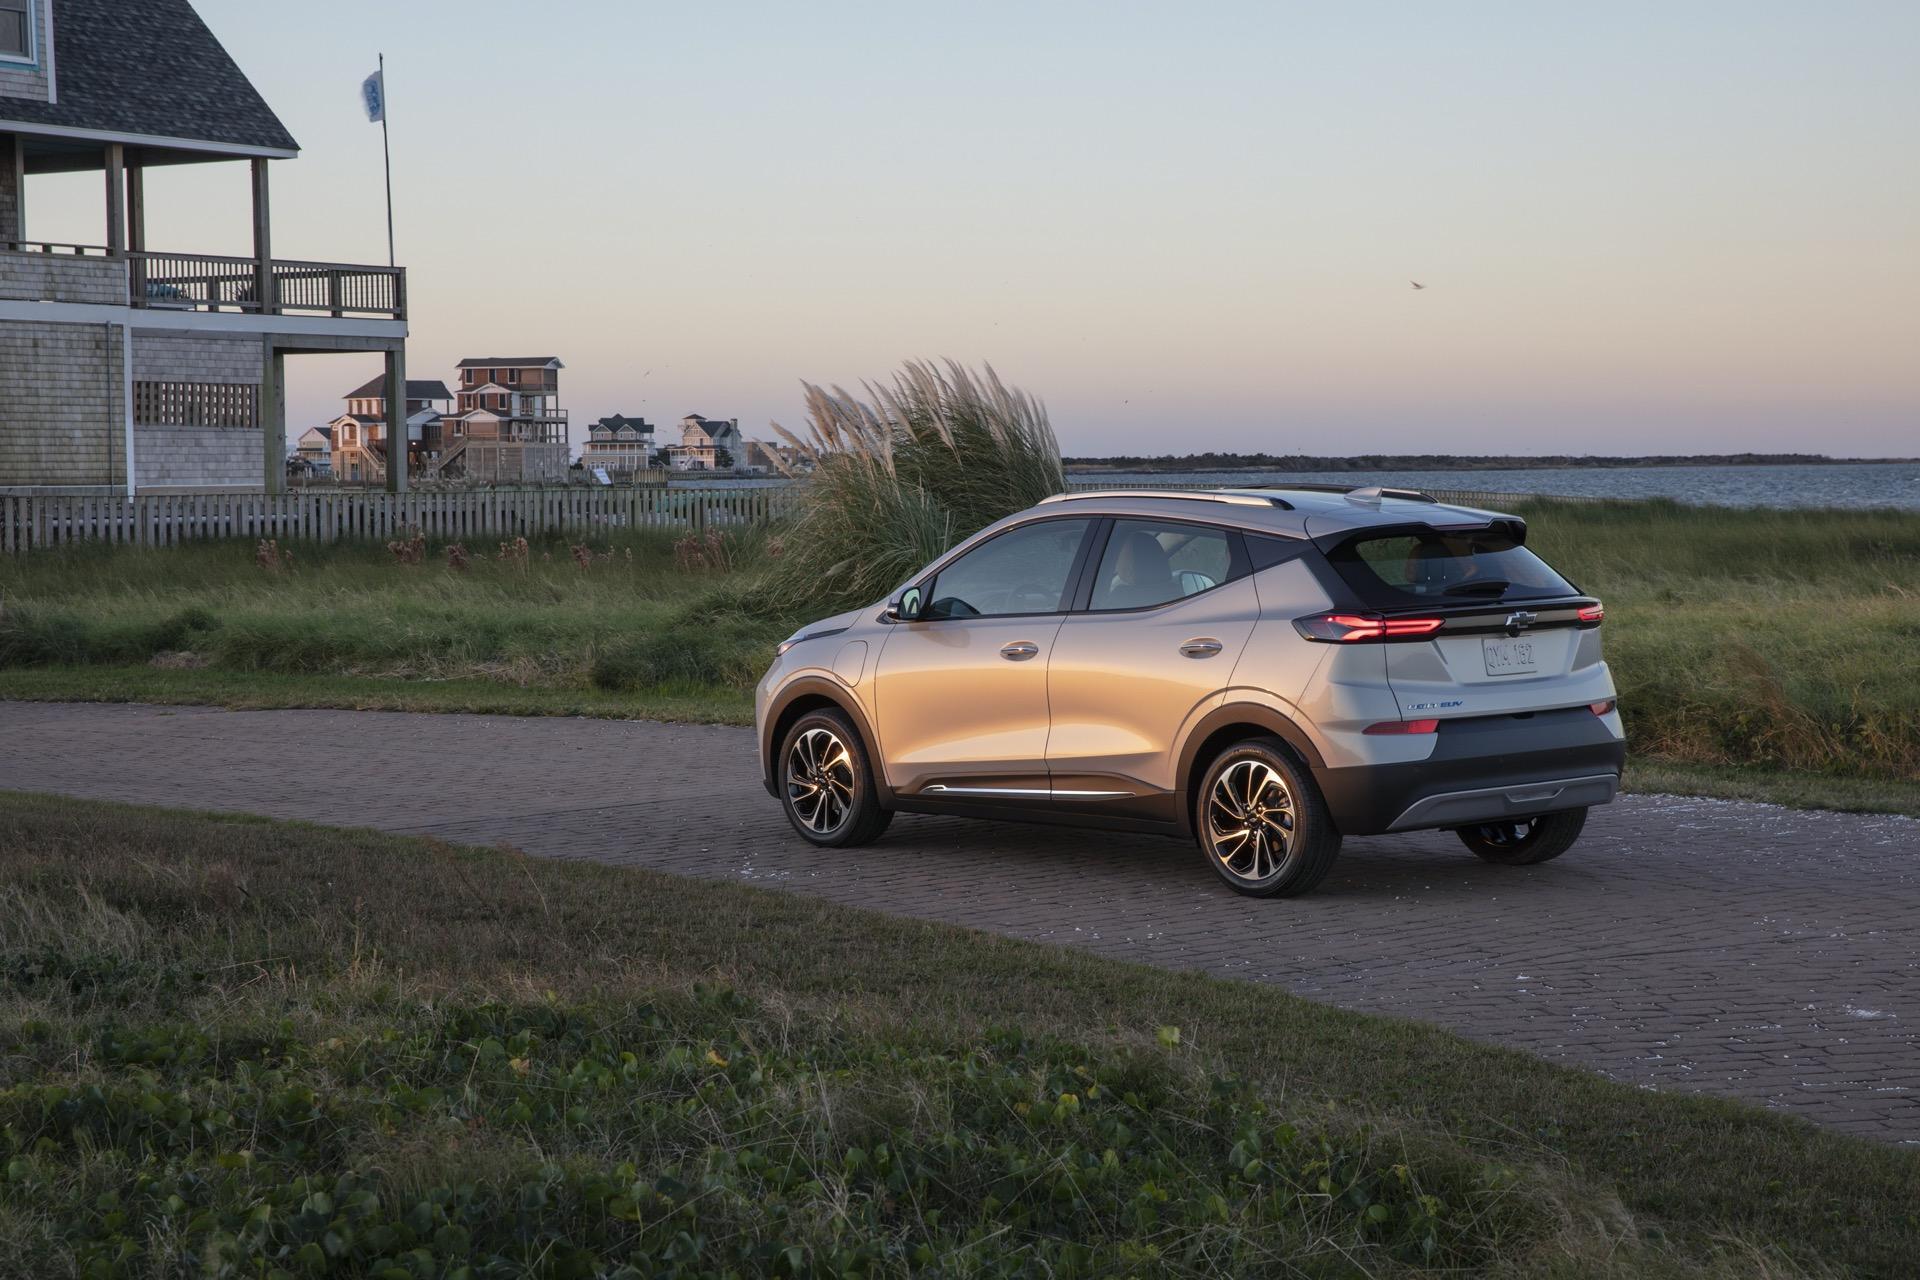 Electric Subaru, Bolt EV range test, Hummer EV off-road, Toyota electric plans: The Week in Reverse